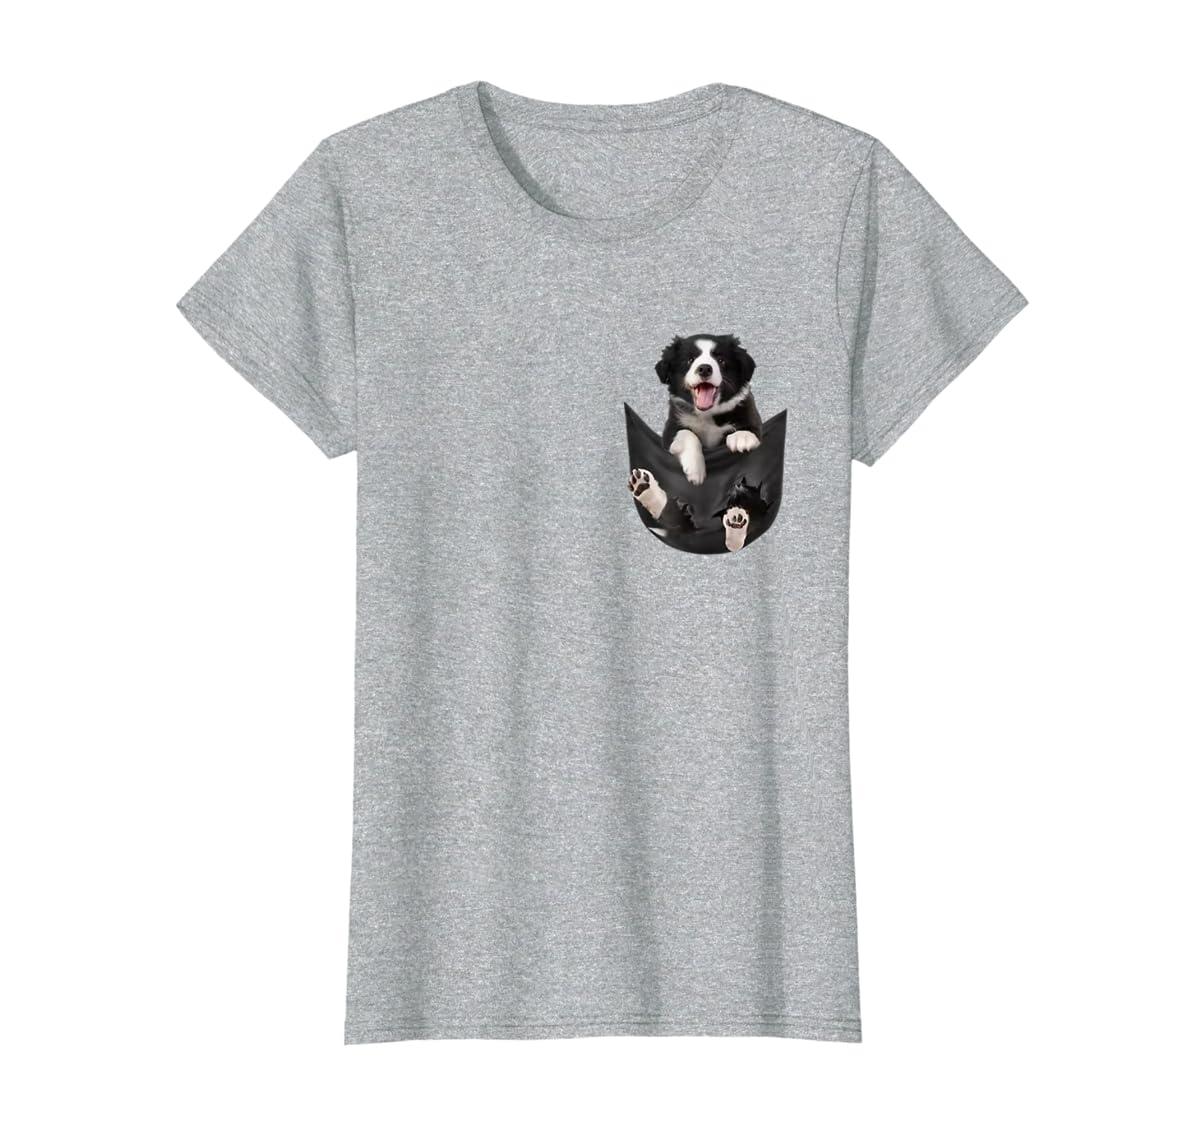 Border Collies Inside In Pocket Dog Lover T shirt Funny Cute-Women's T-Shirt-Sport Grey